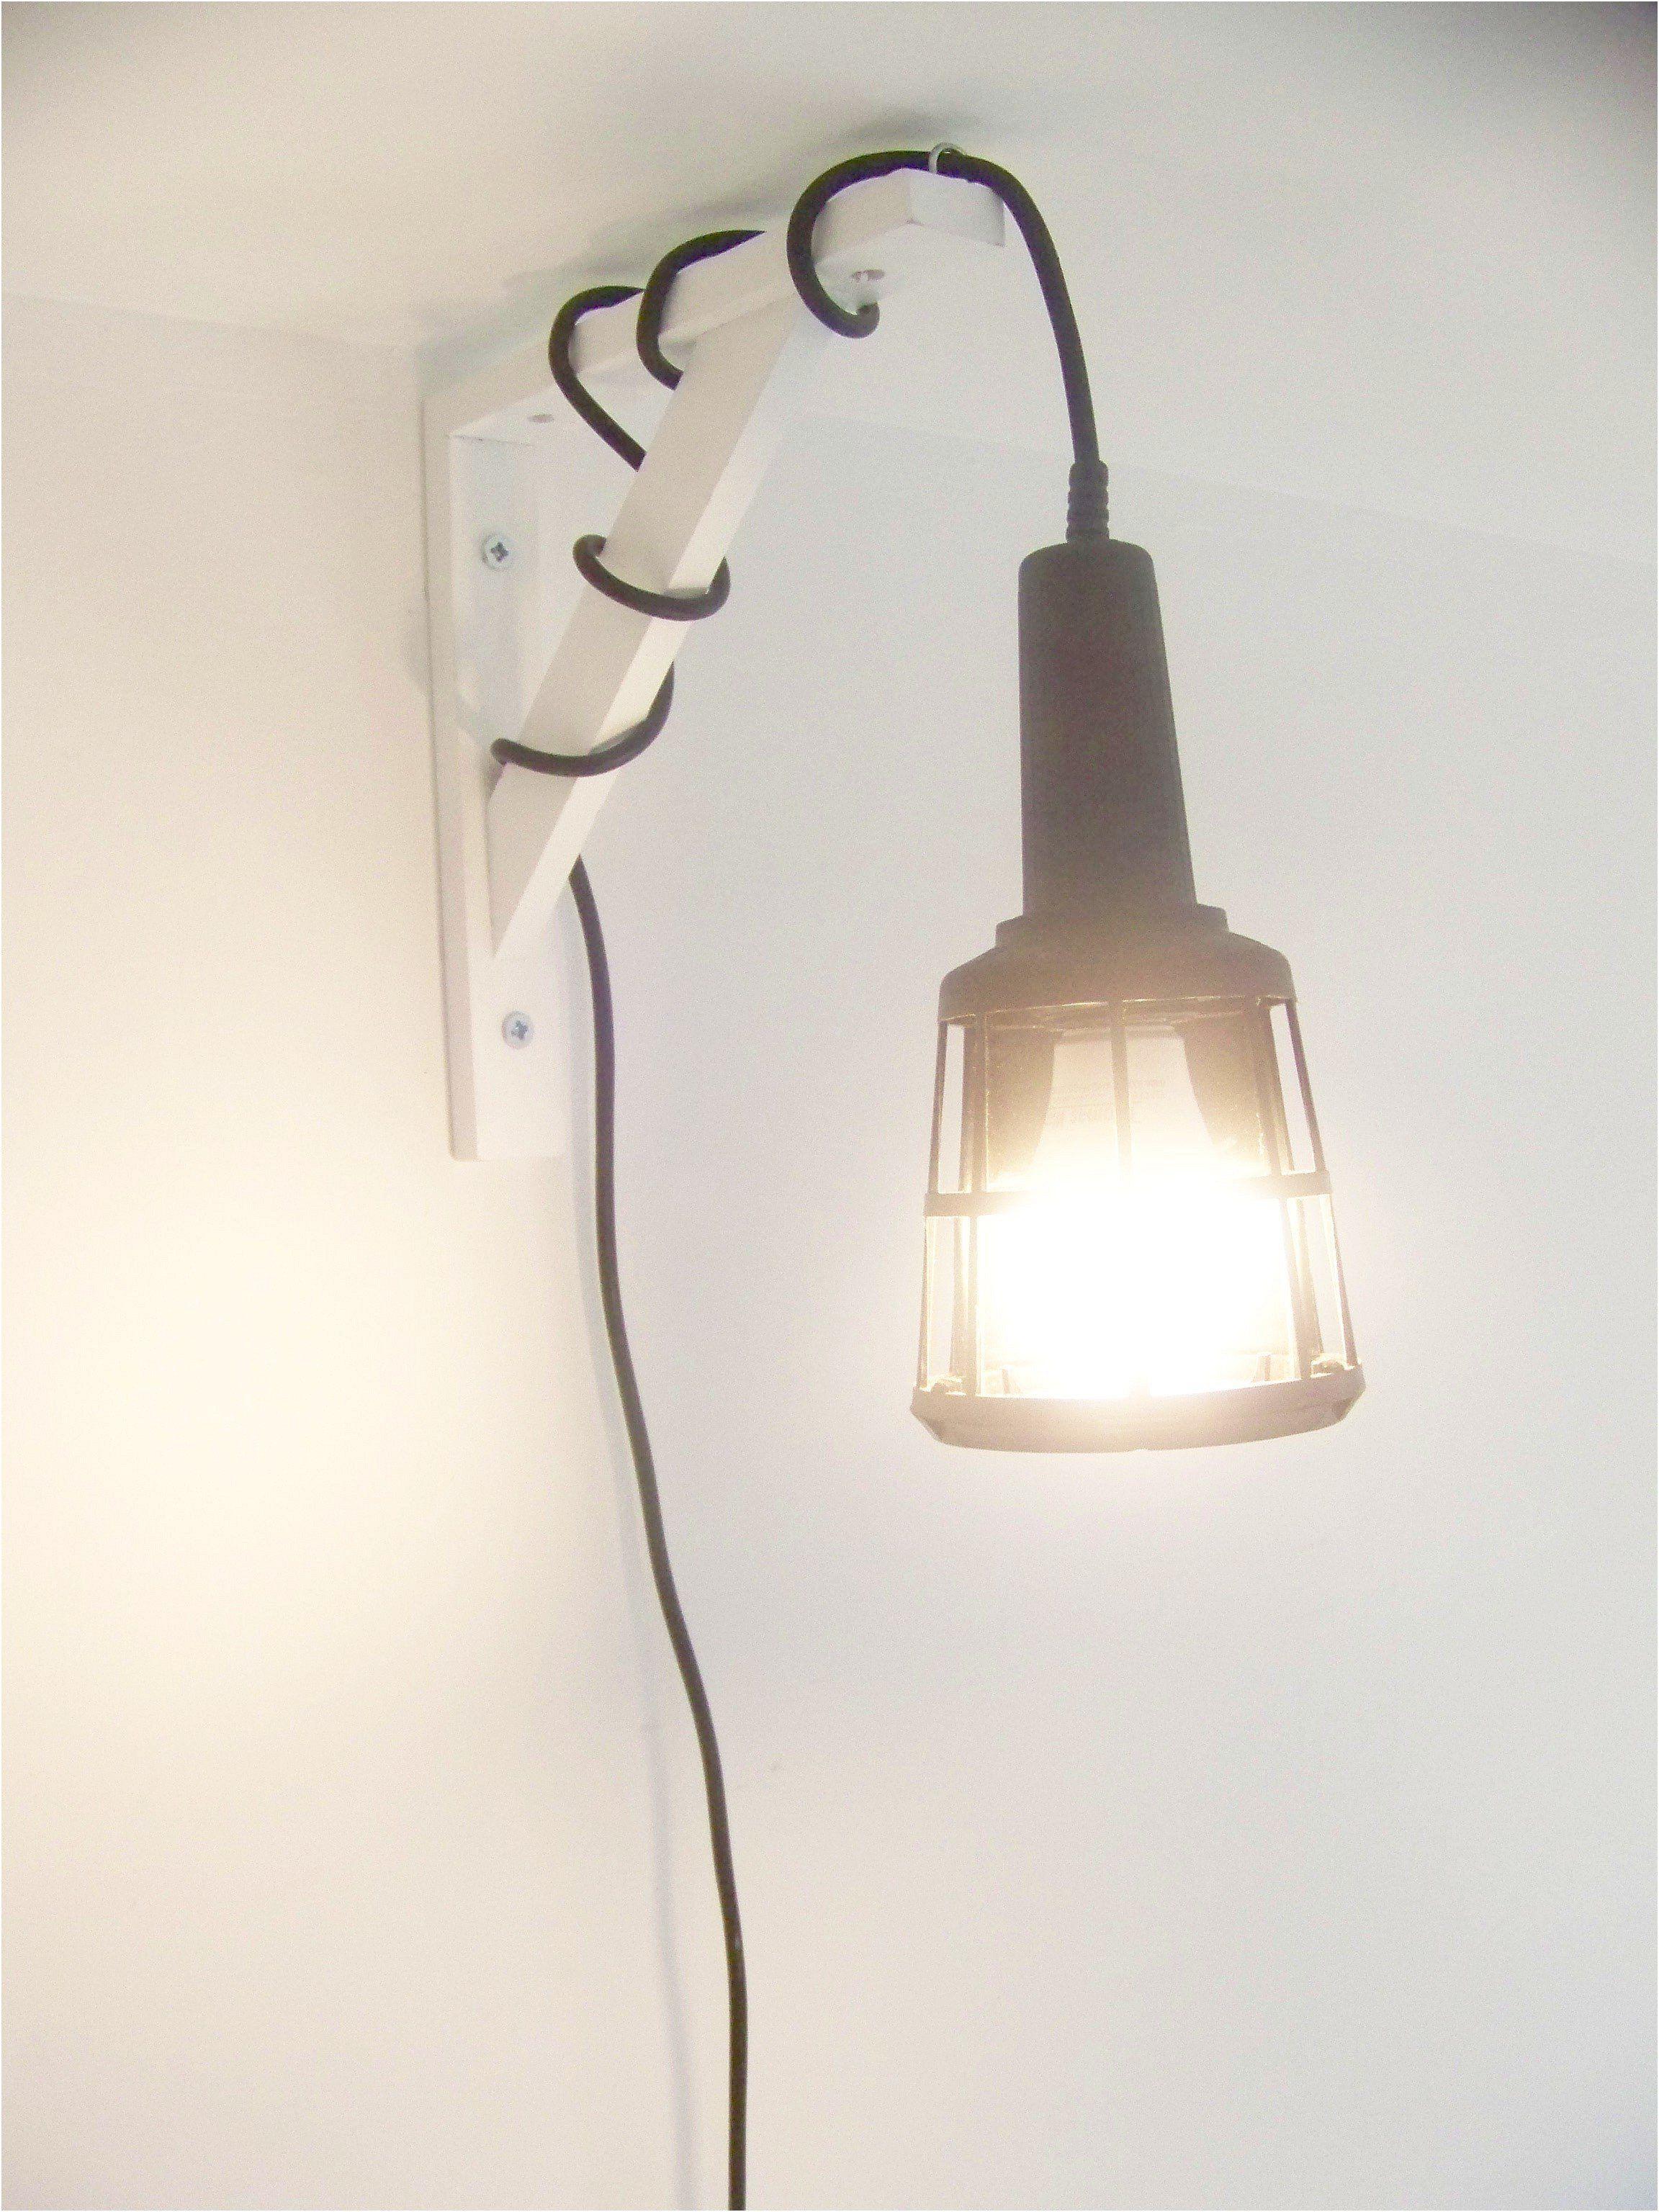 10 Meilleur De Suspension Industrielle Castorama Collection Castorama Luminaire Plafonnier Design Diy Applique Murale